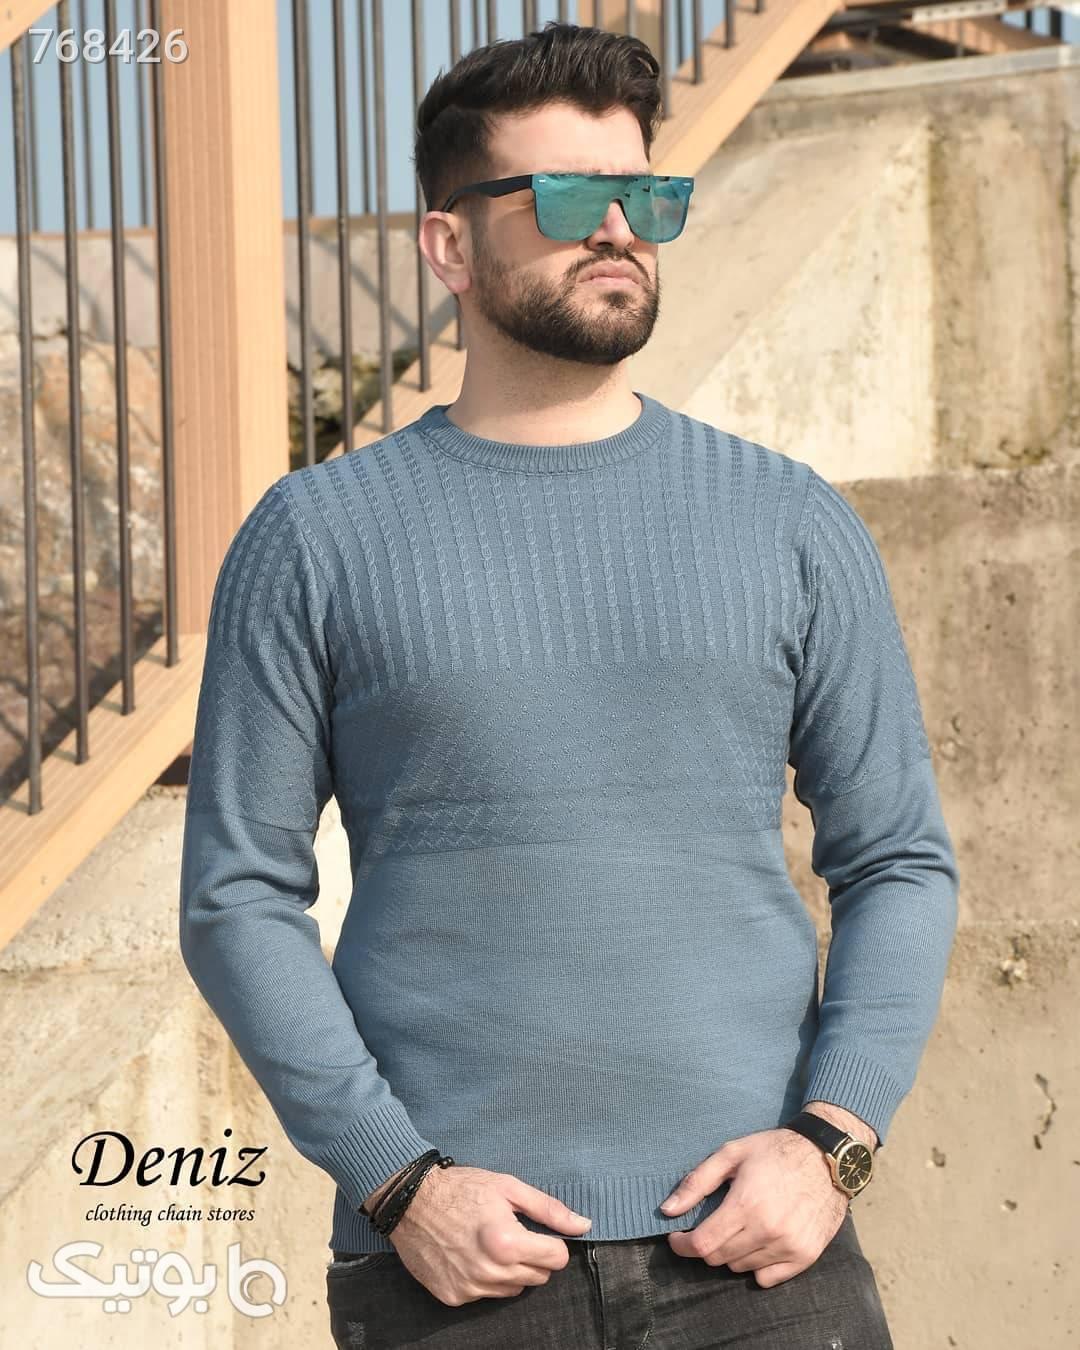 بافت مردانه  آبی پليور و ژاکت مردانه